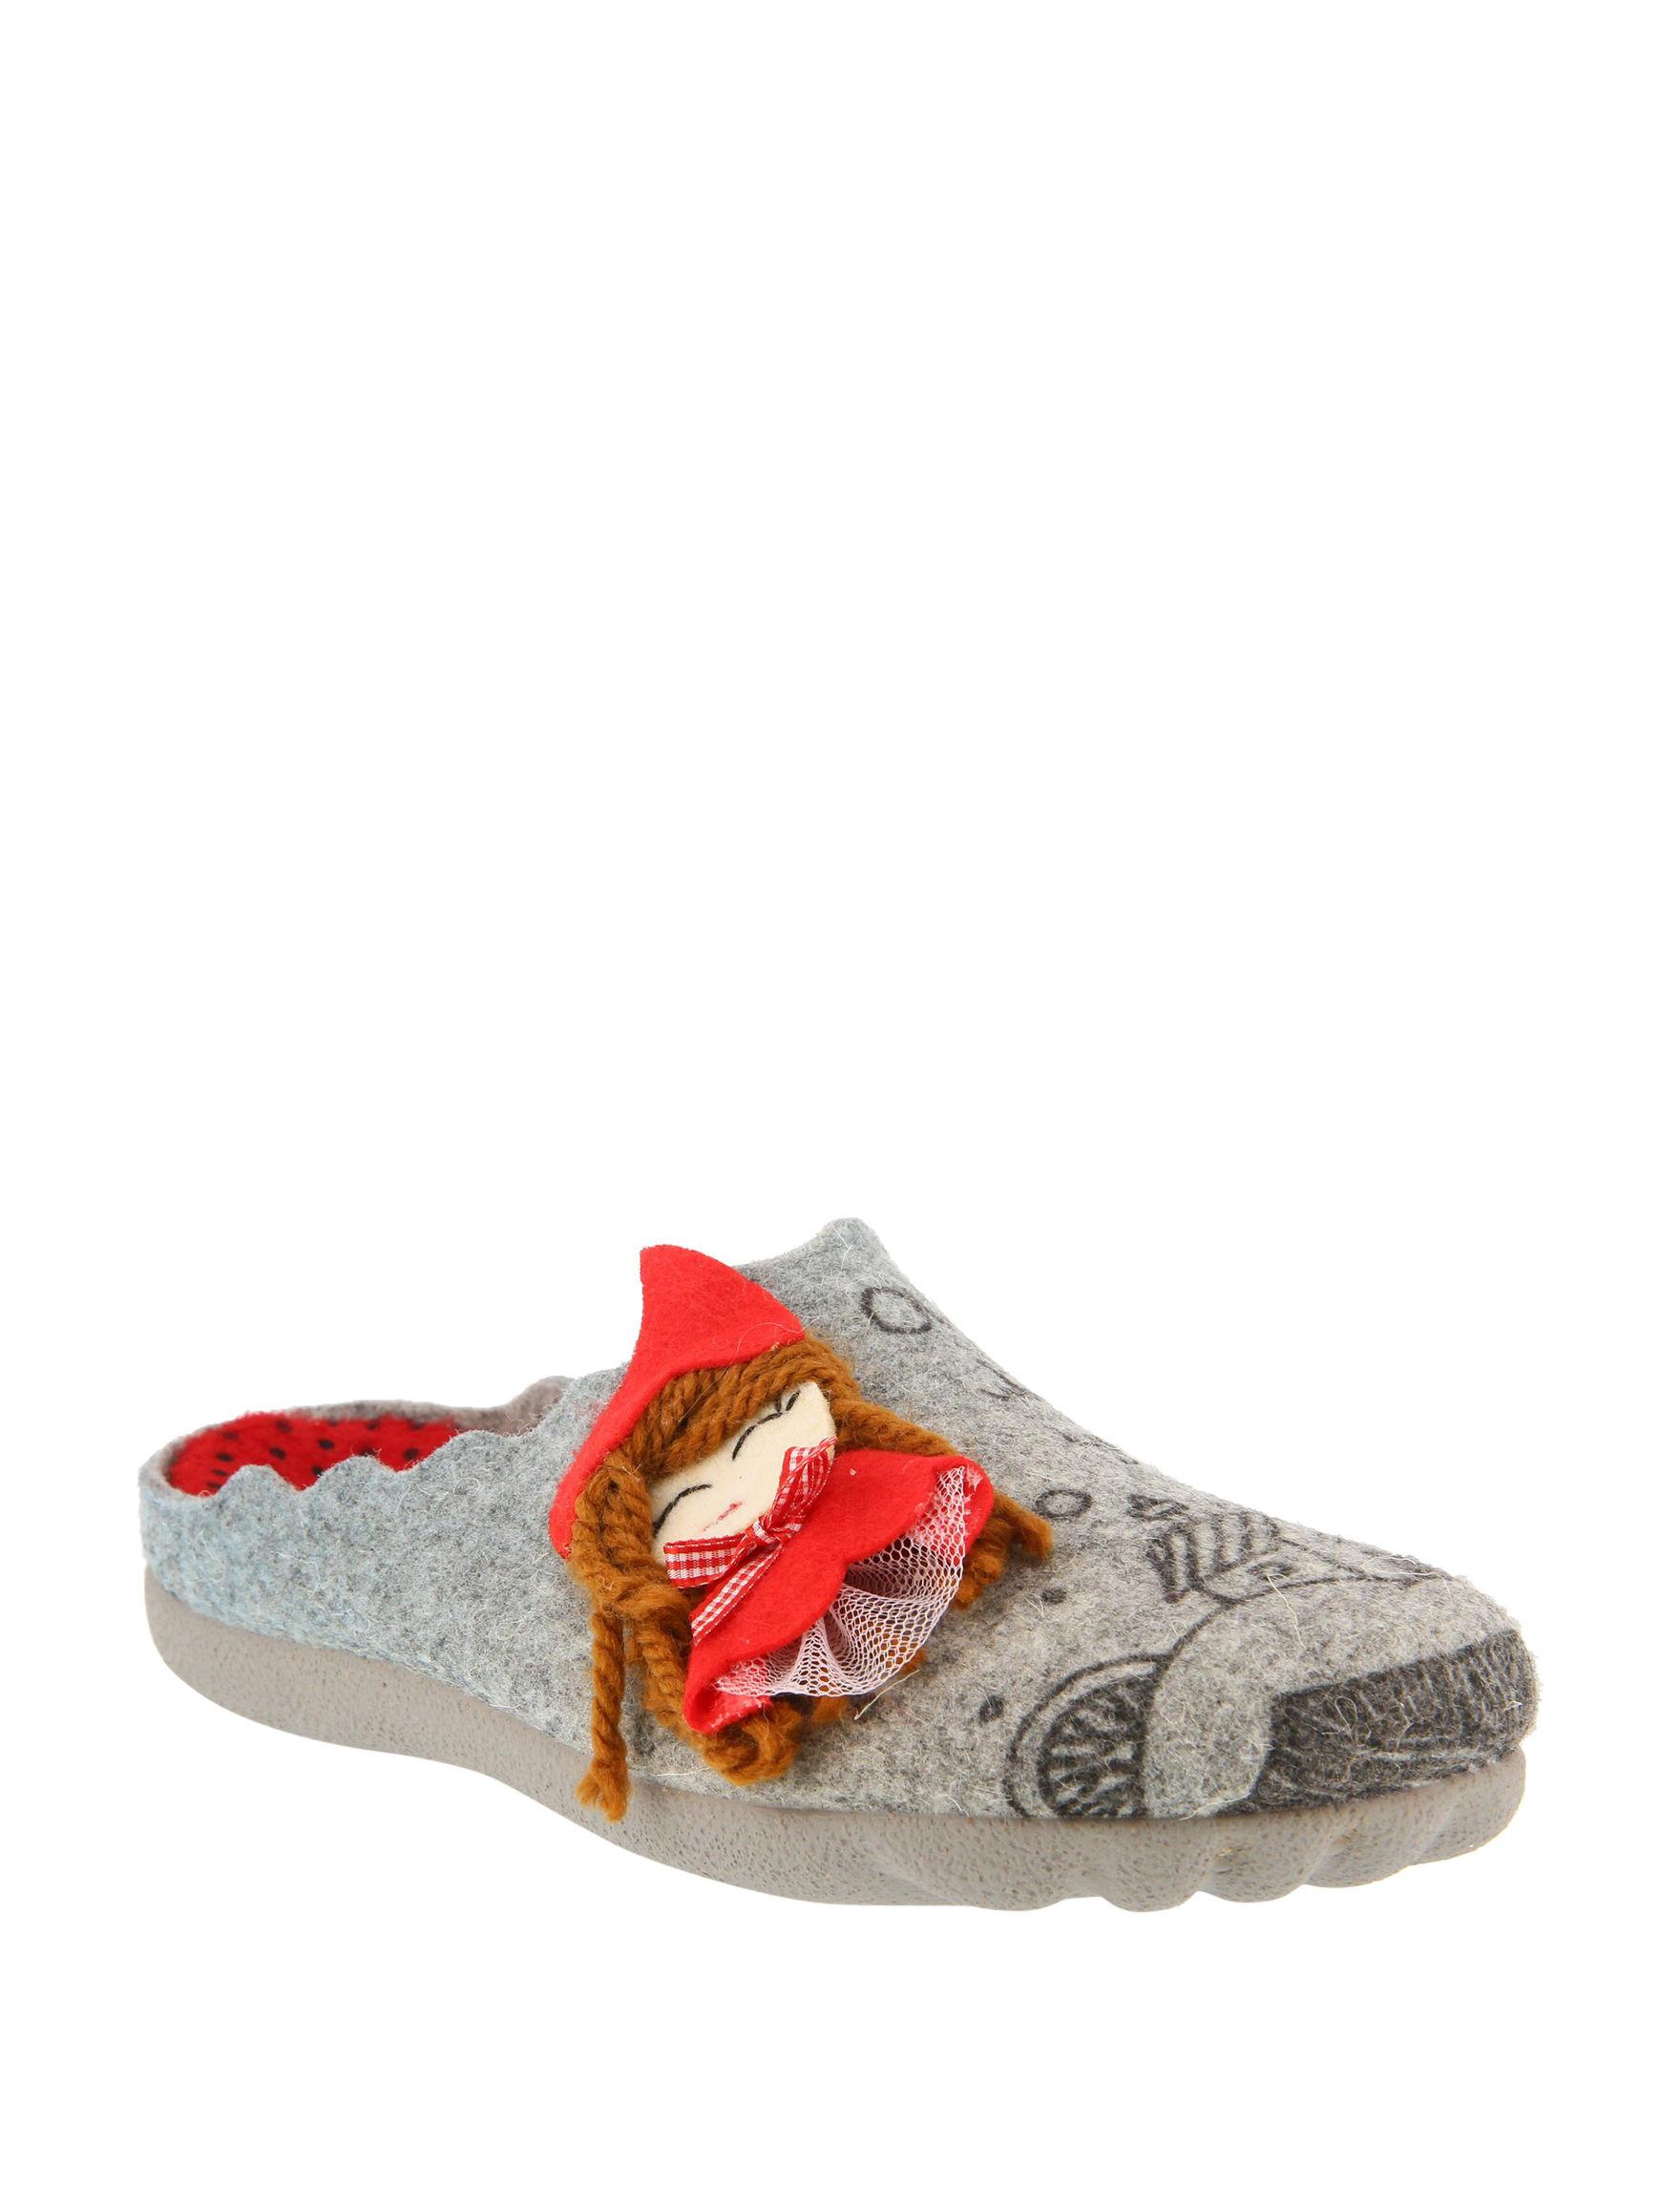 Flexus Gray Slipper Shoes